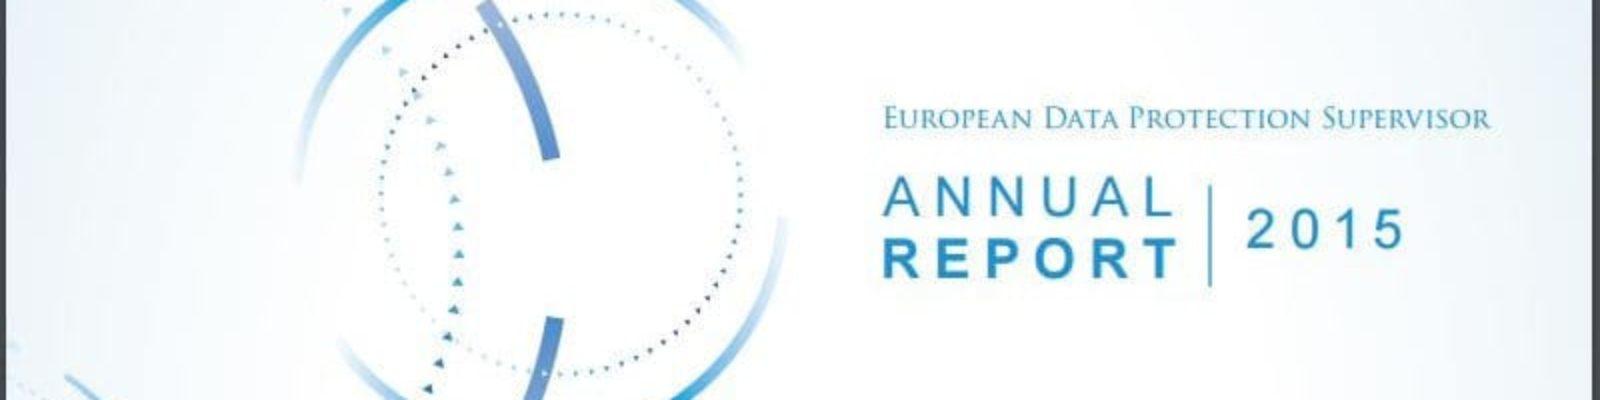 EDPS annual report (2015)